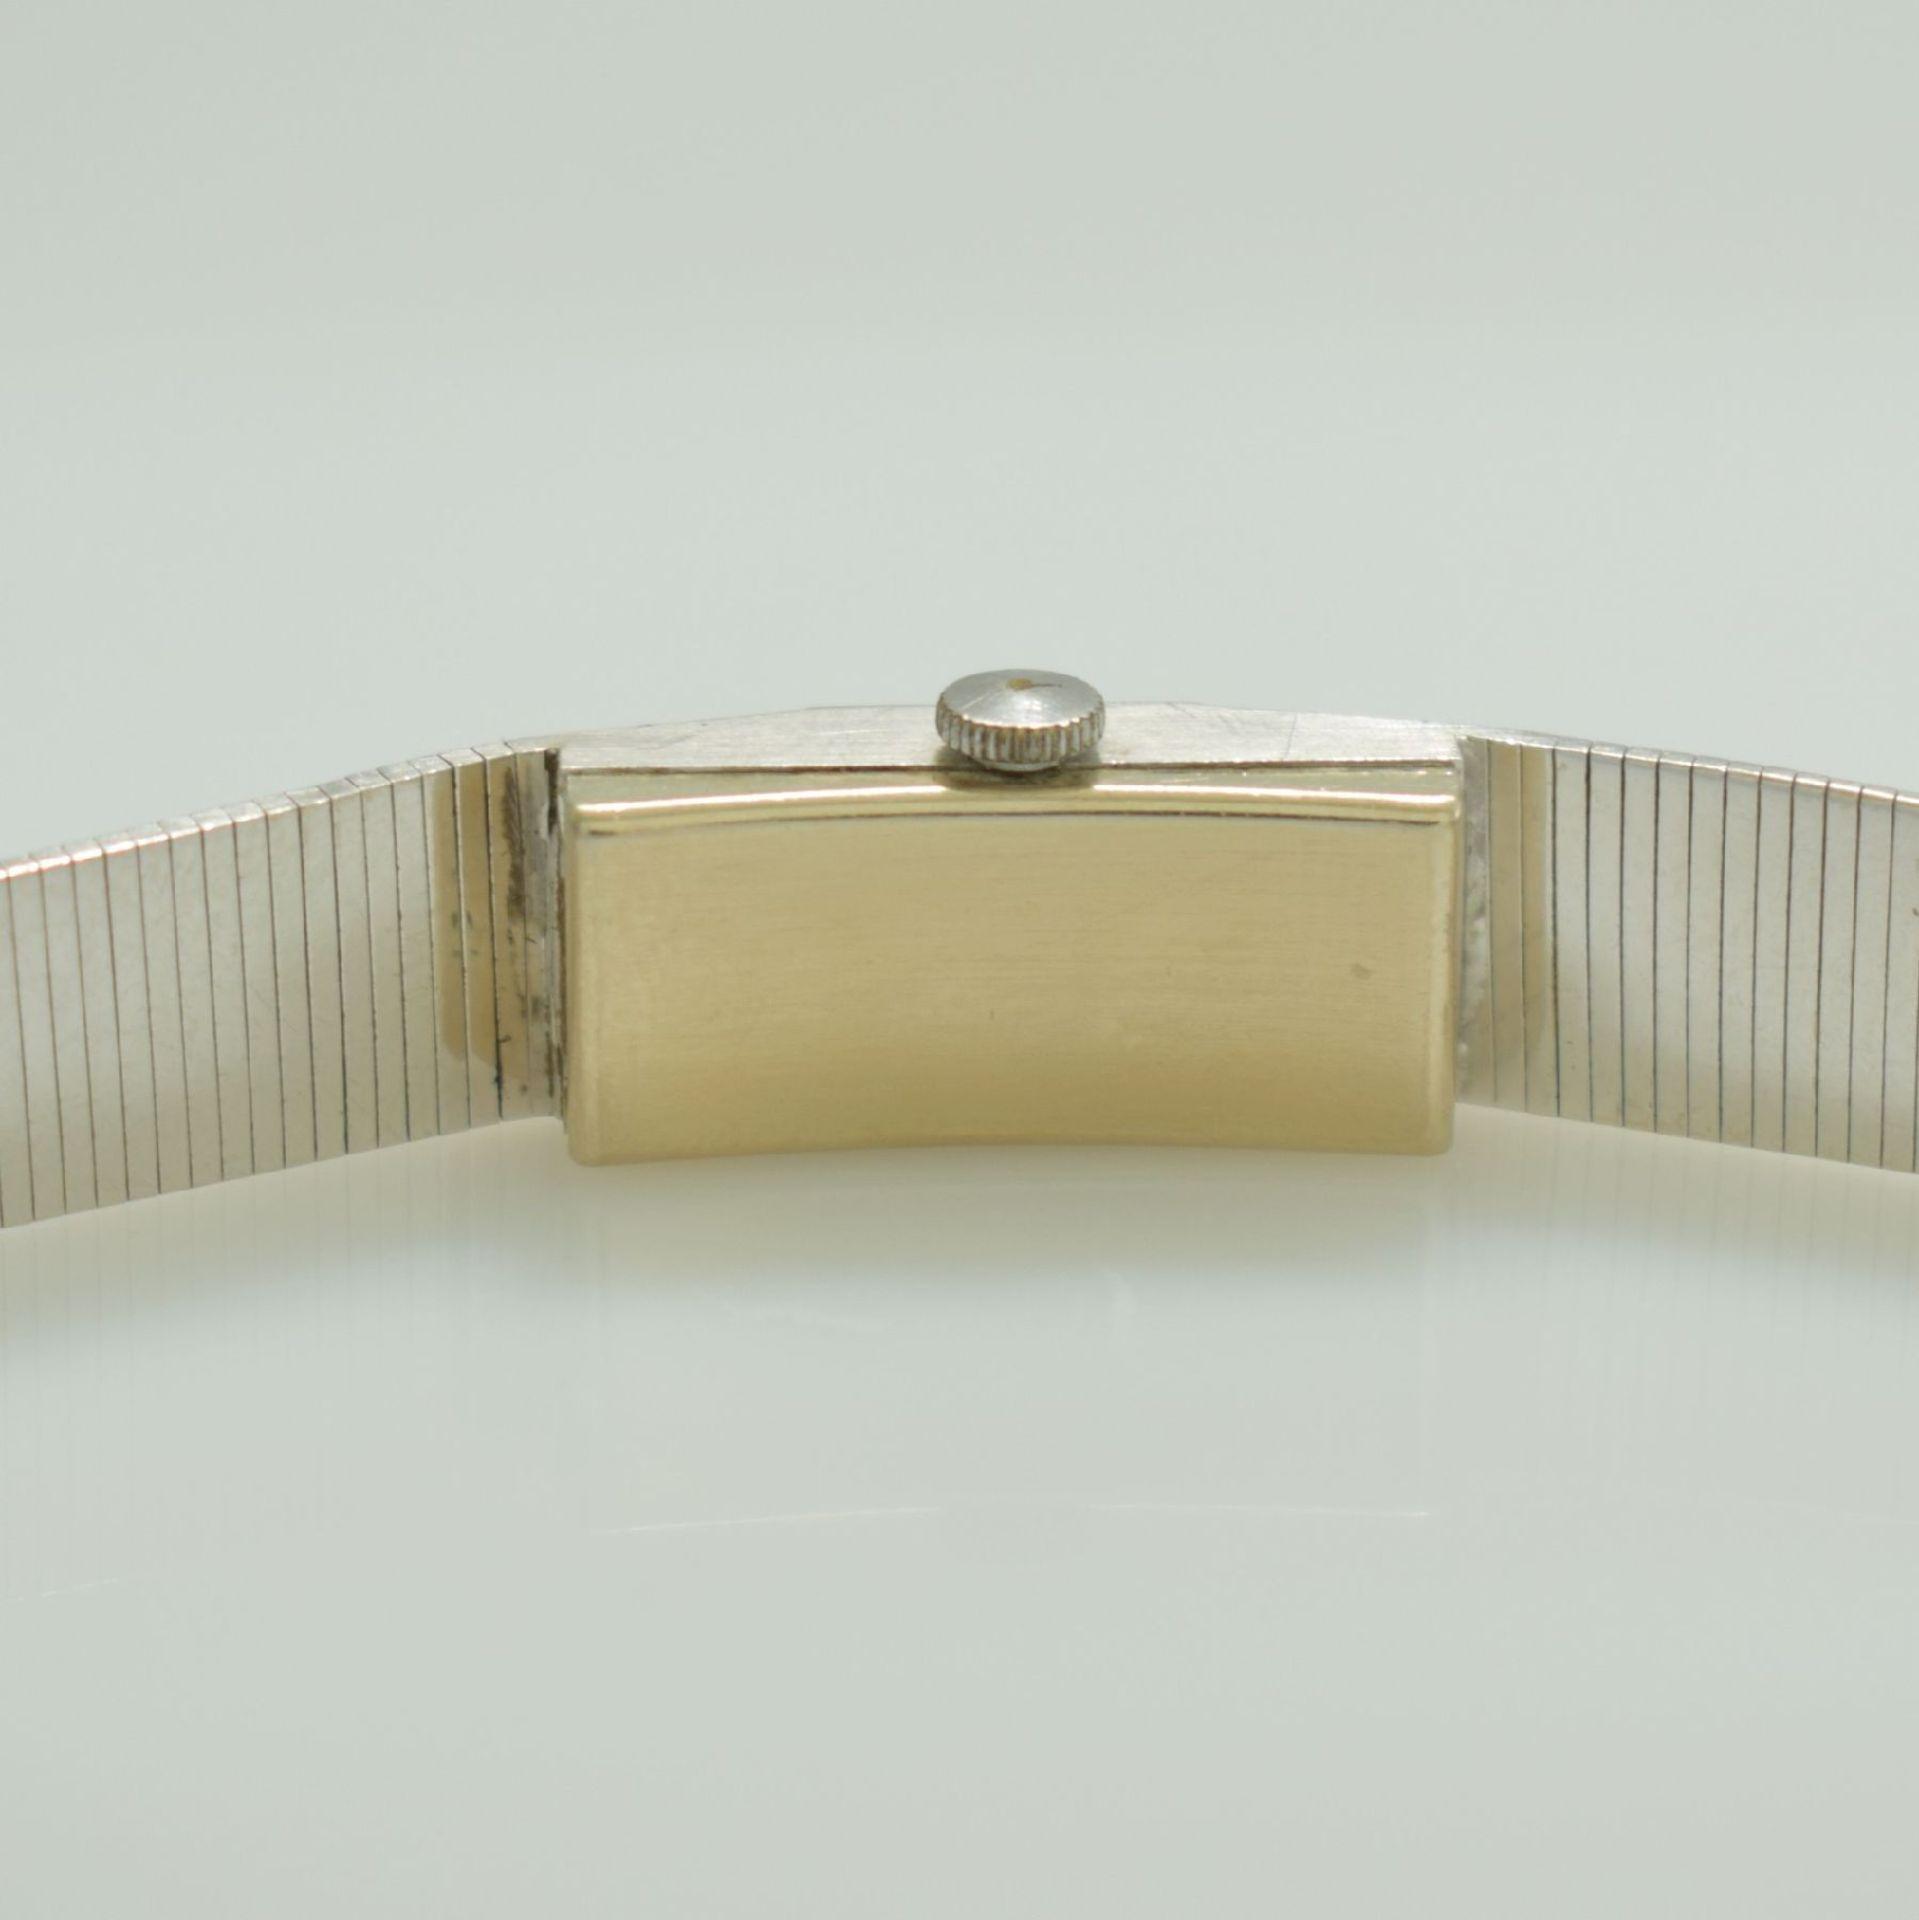 ONSA Damenarmbanduhr in WG 585/000, Schweiz um 1960, Handaufzug, Boden gedr., Band in WG 585/000, - Bild 6 aus 6